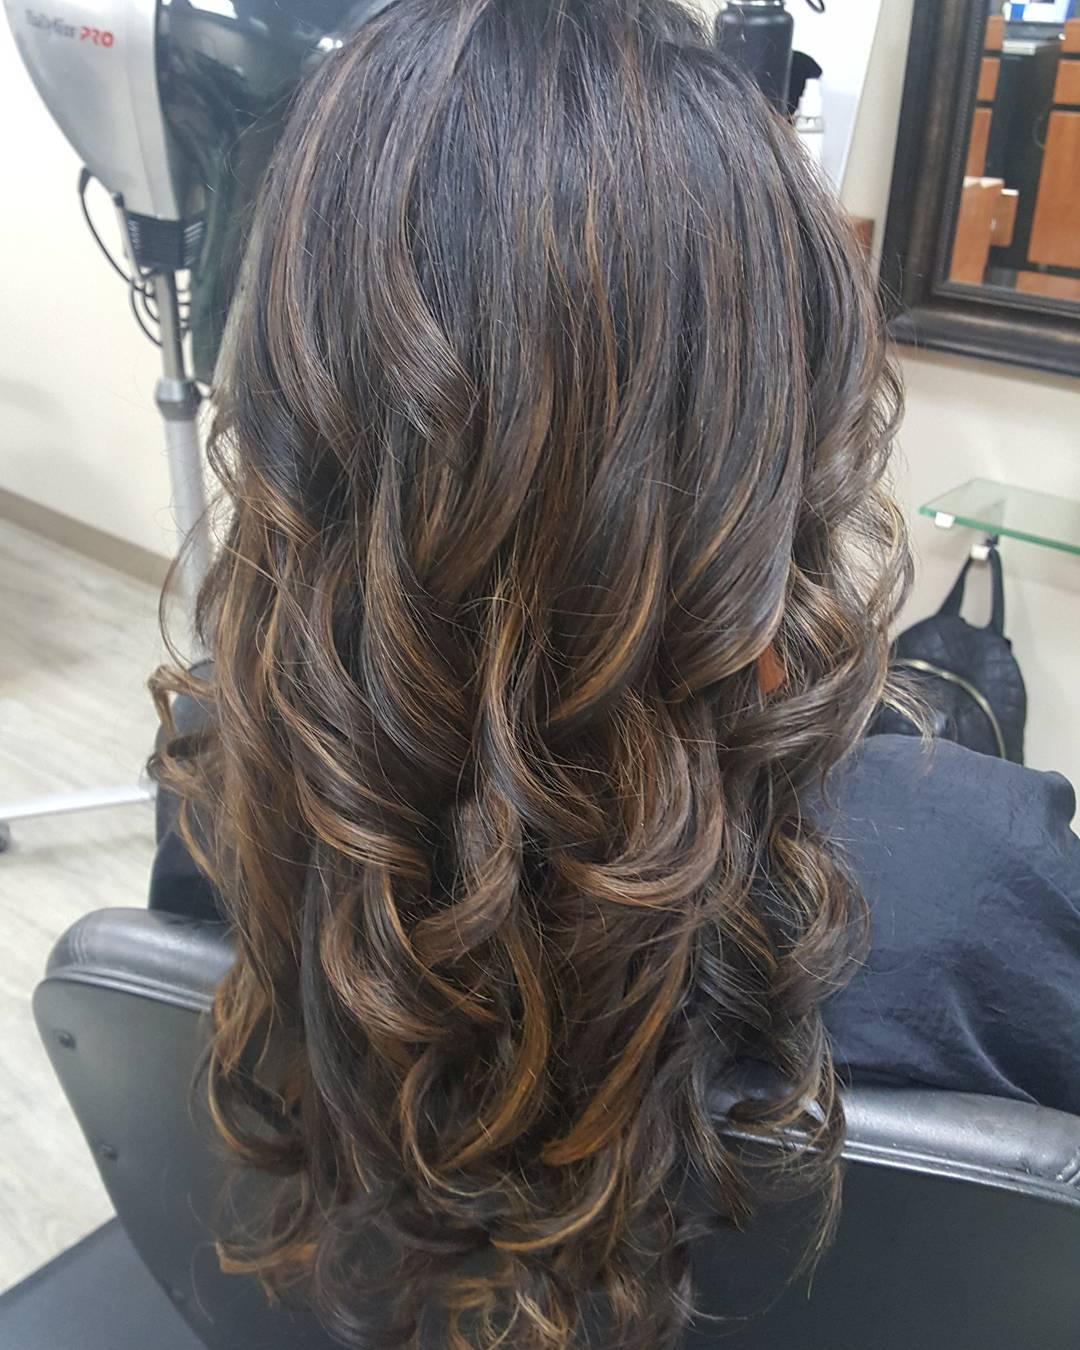 Haircut Styles For Long Thin Hair: 35 Smart Layered Haircuts For Long Hair Spring 2017